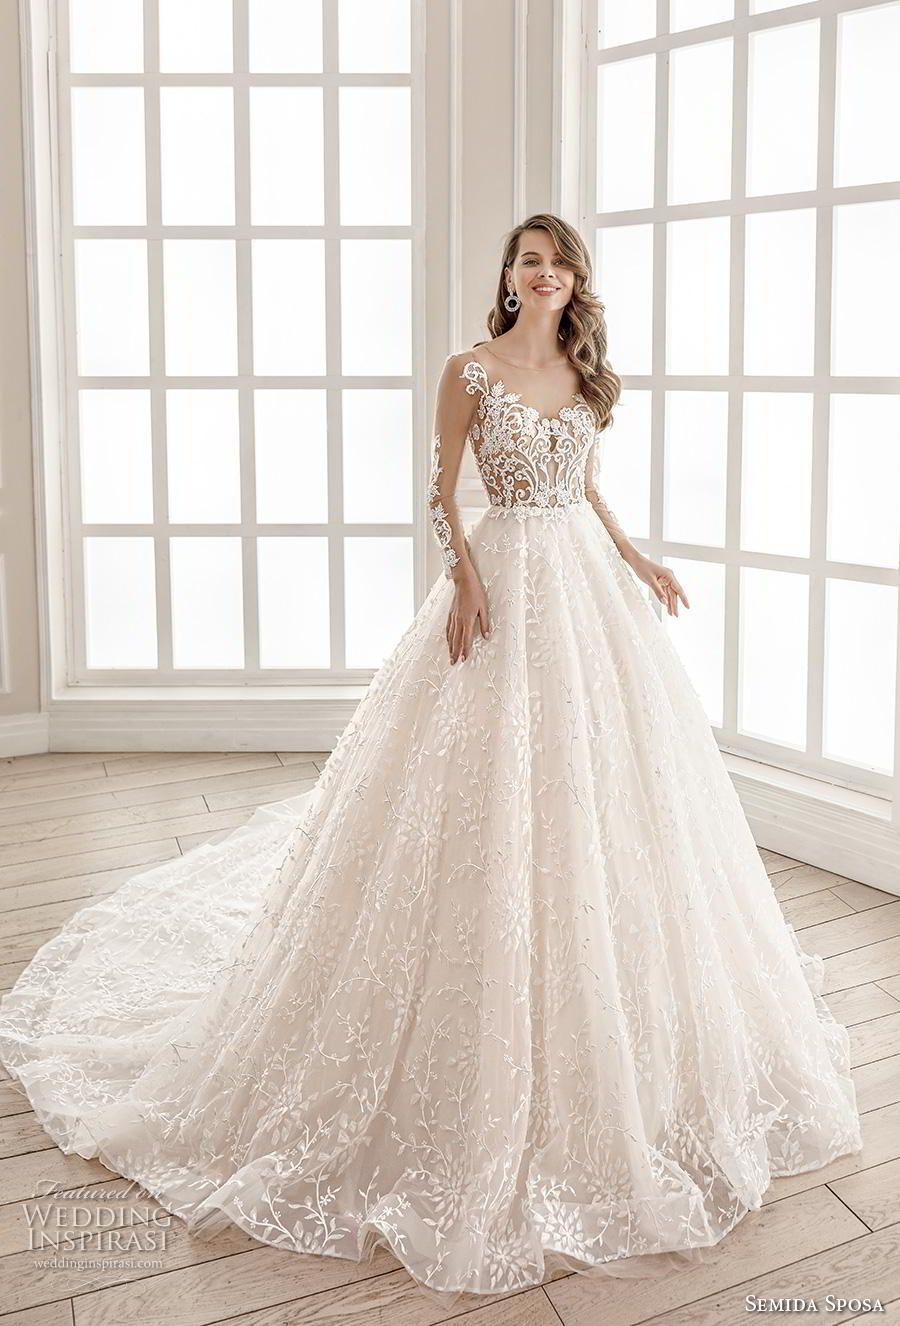 Semida Sposa 2020 Wedding Dresses Amazon Bridal Collection Wedding Inspirasi Sheer Wedding Dress Bridal Dresses Princess Ball Gowns